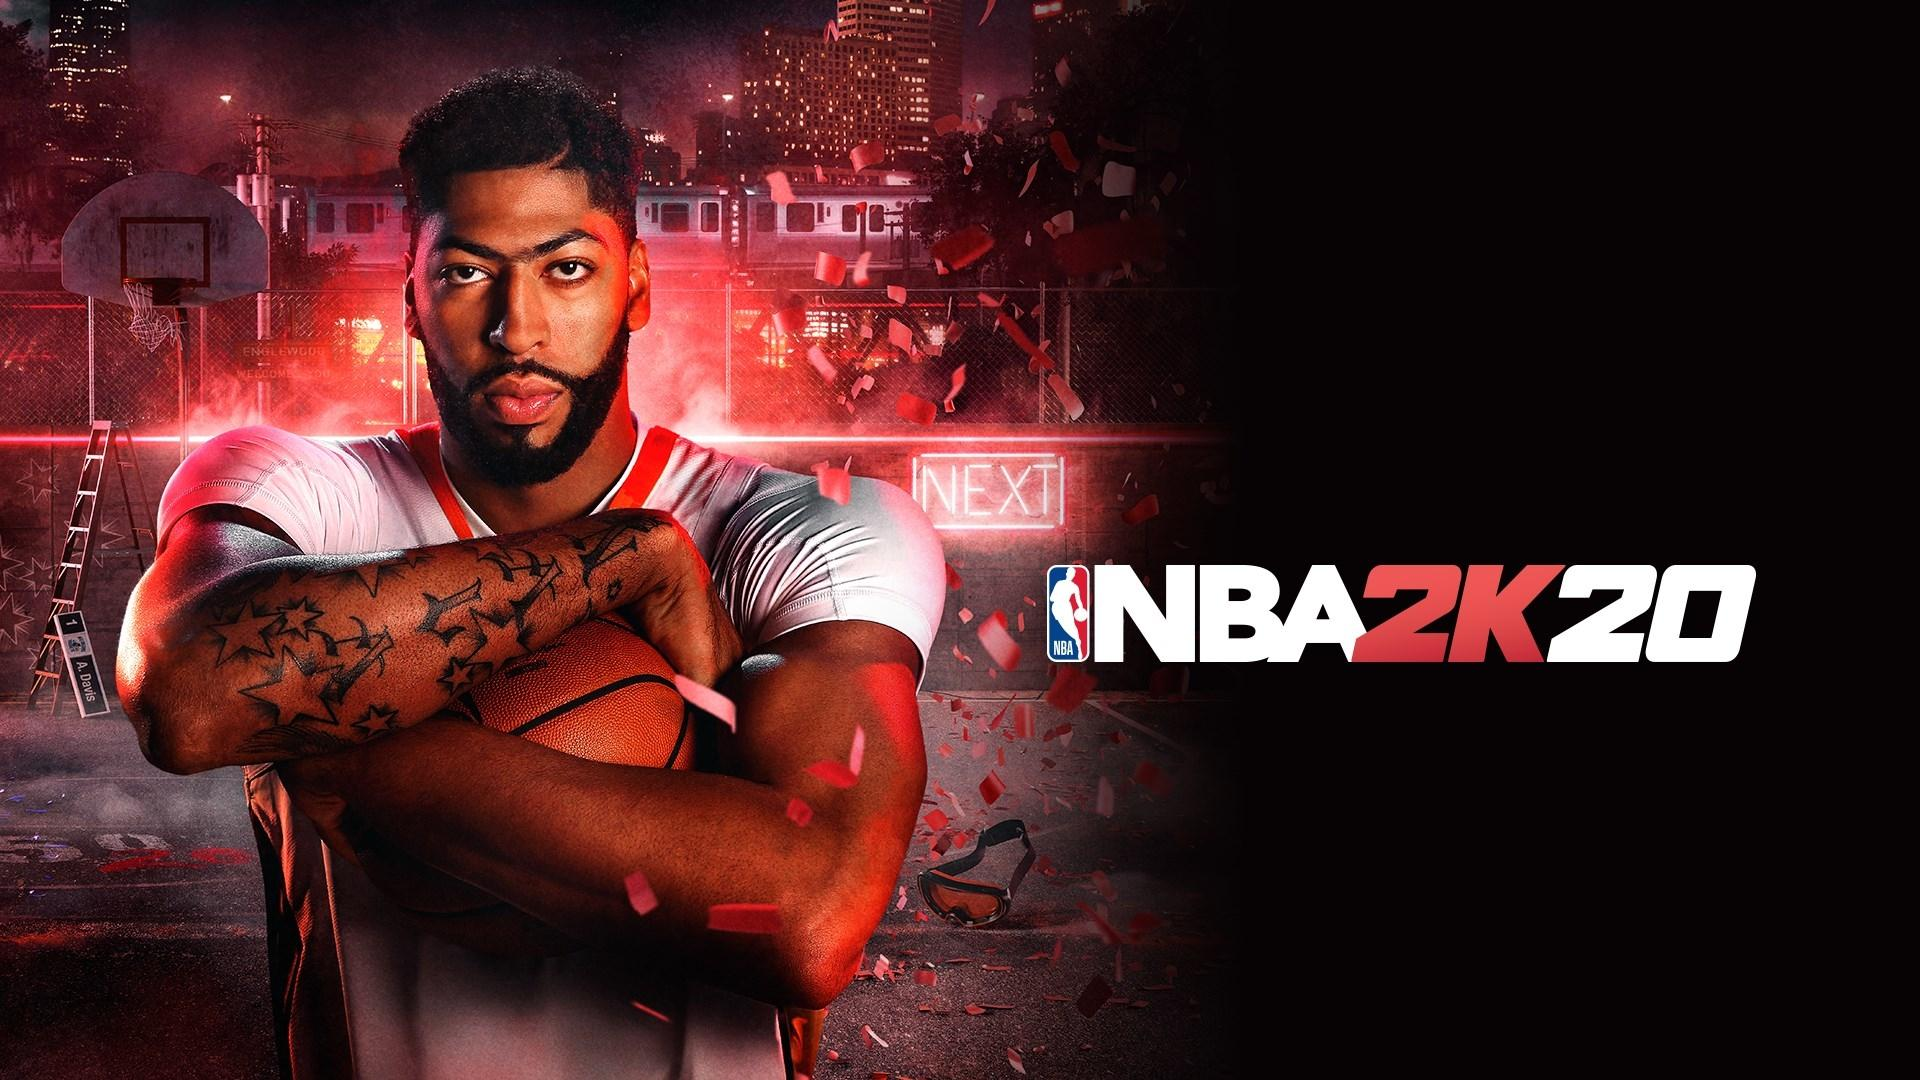 NBA 2K20 HD Wallpapers 1920x1080